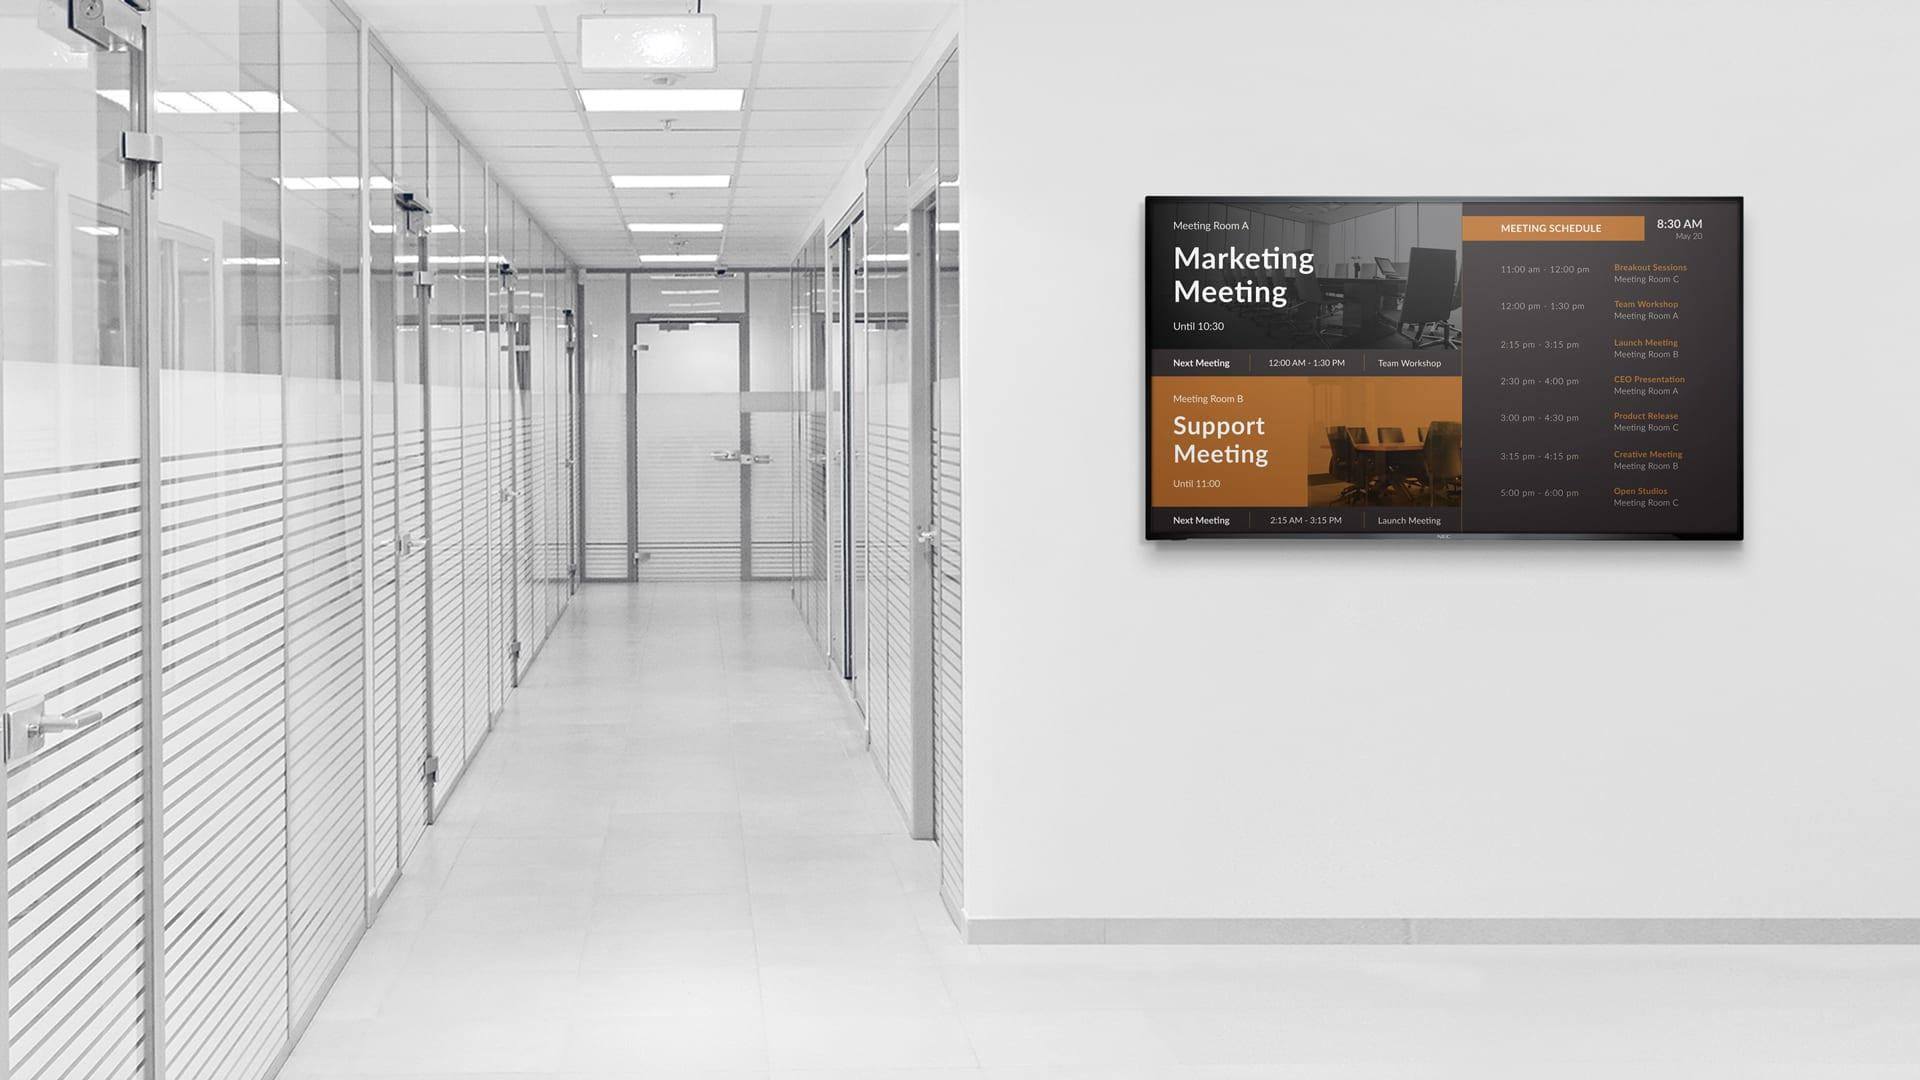 meeting schedule office hallway communication